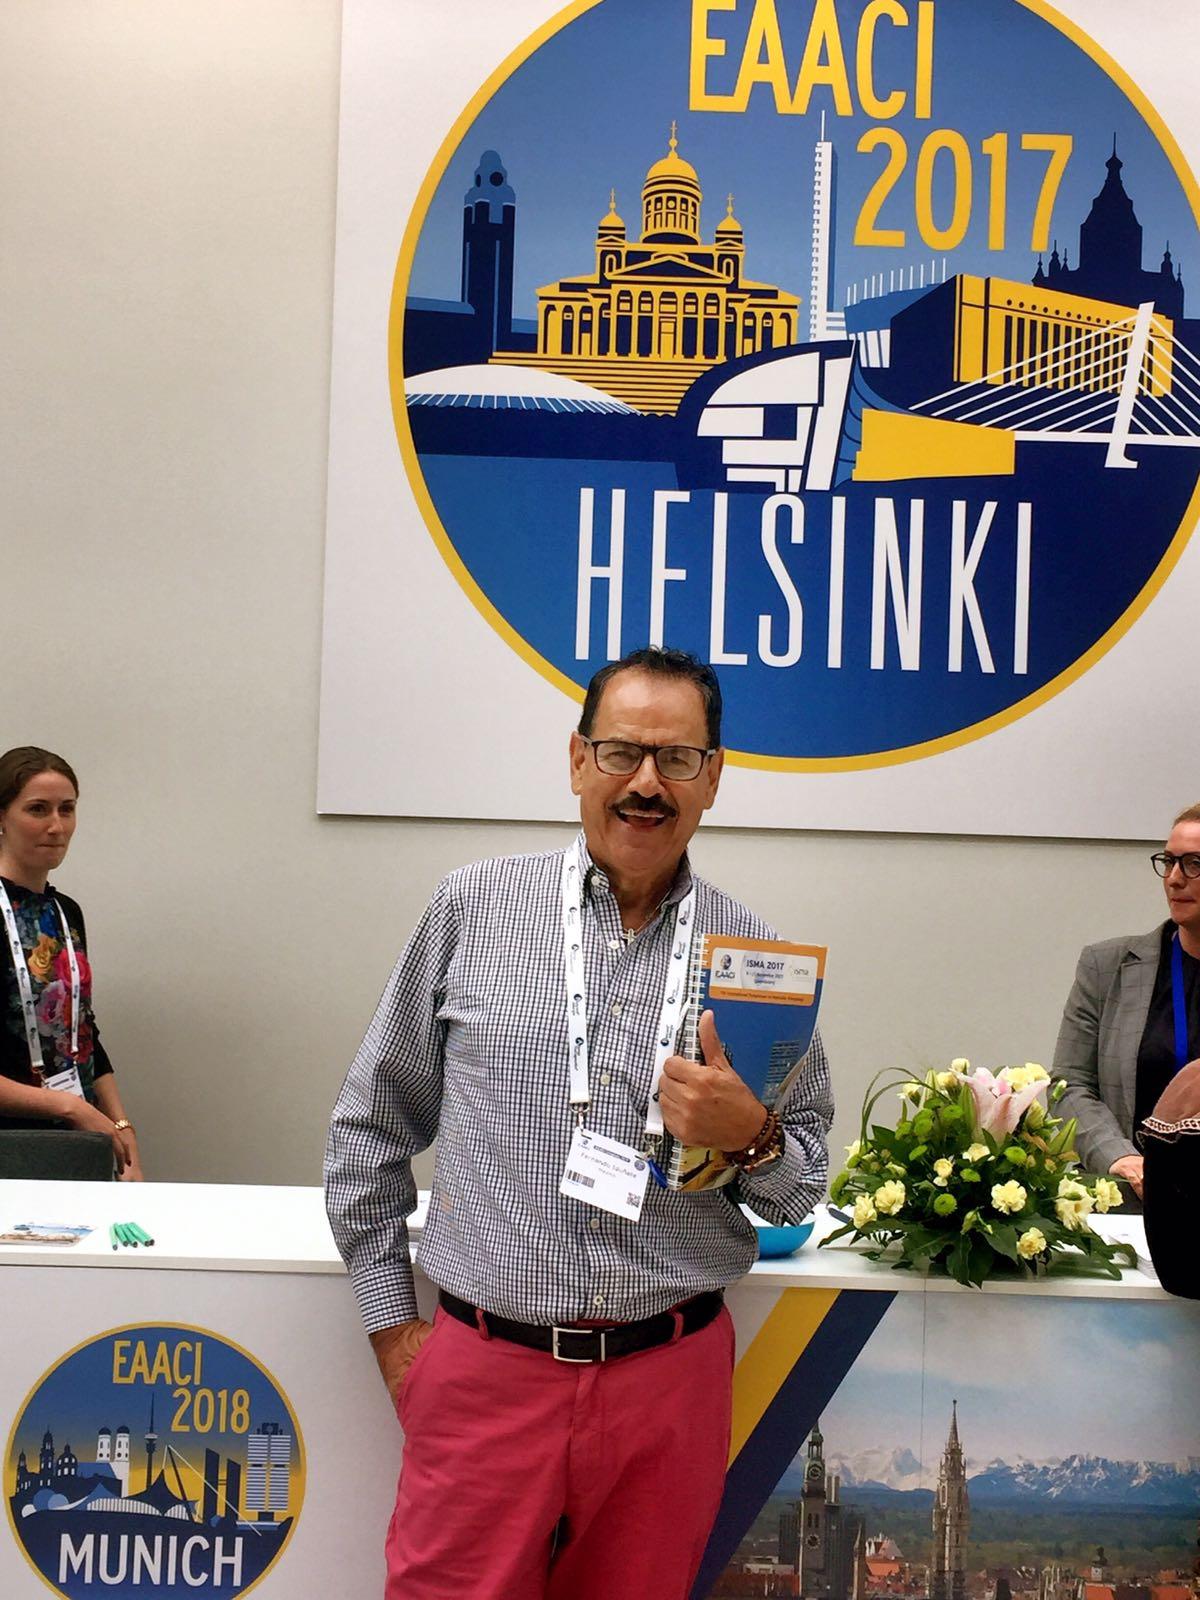 Helsinki Finlandia 2017